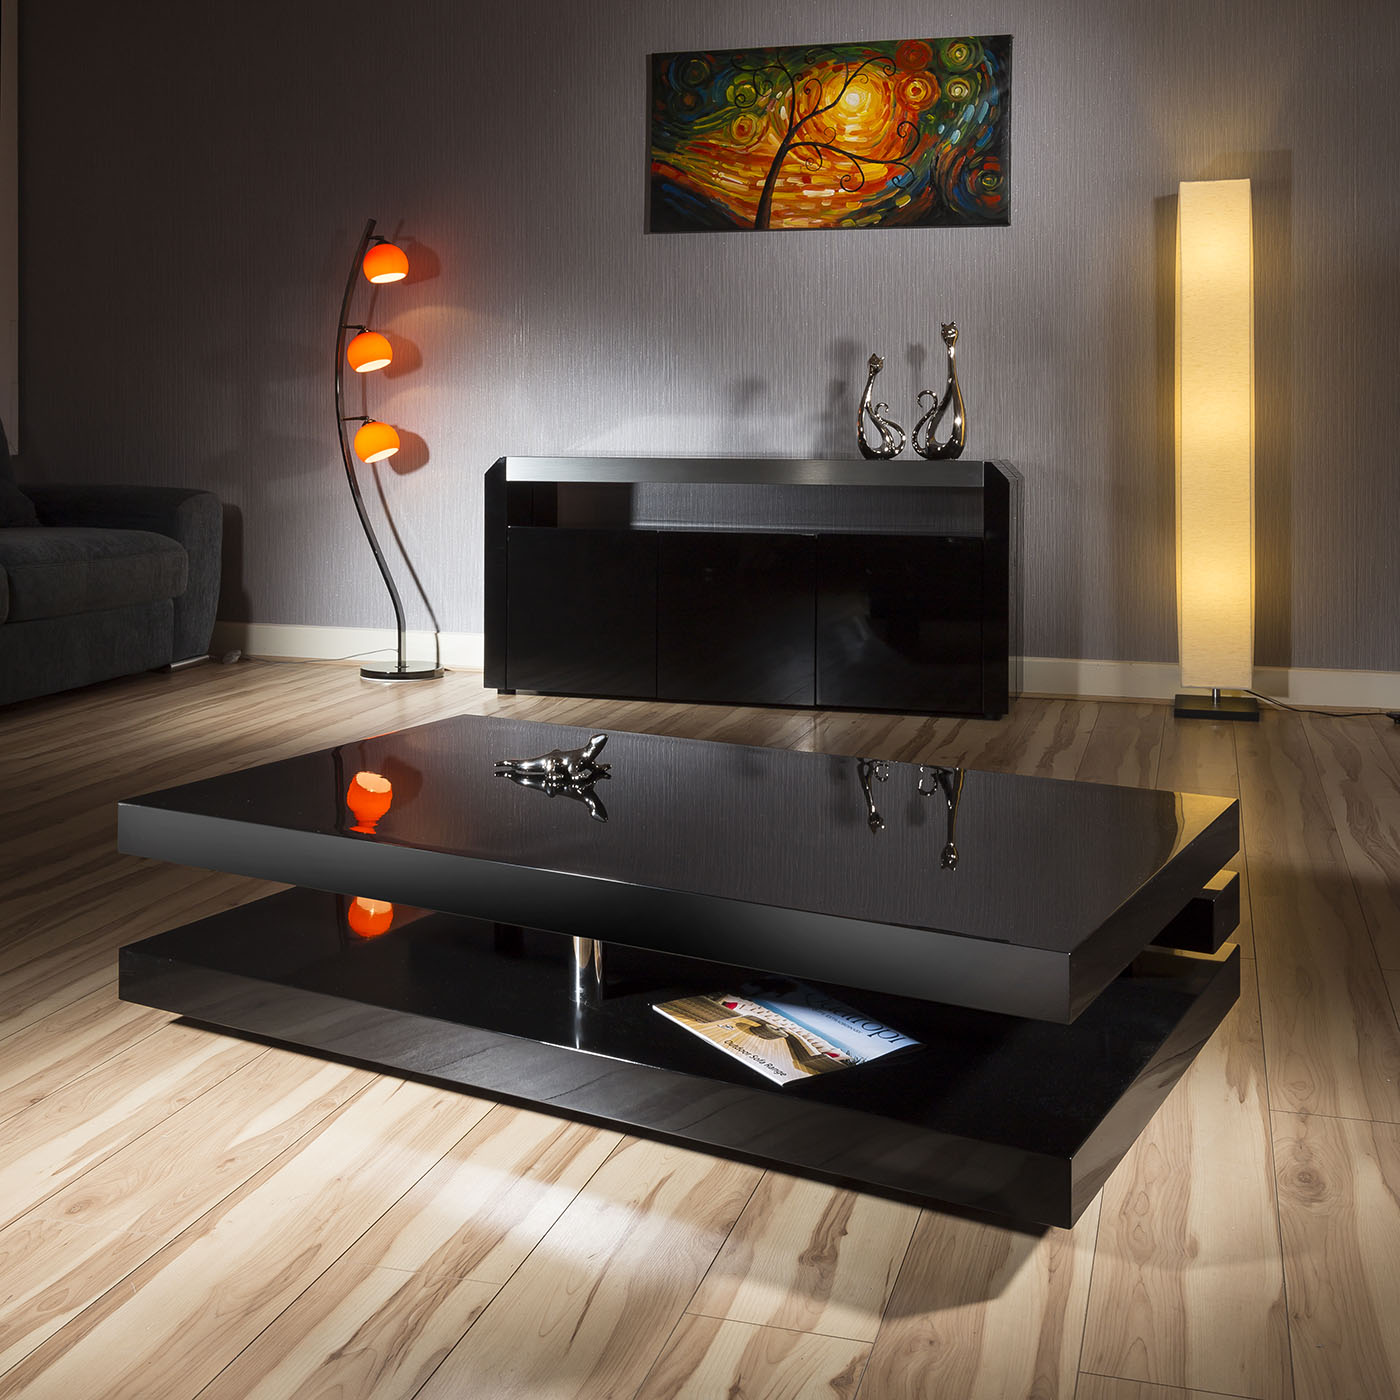 Large Modern Black Coffee Table: Large Designer Rectangular Coffee Table Black Gloss Modern